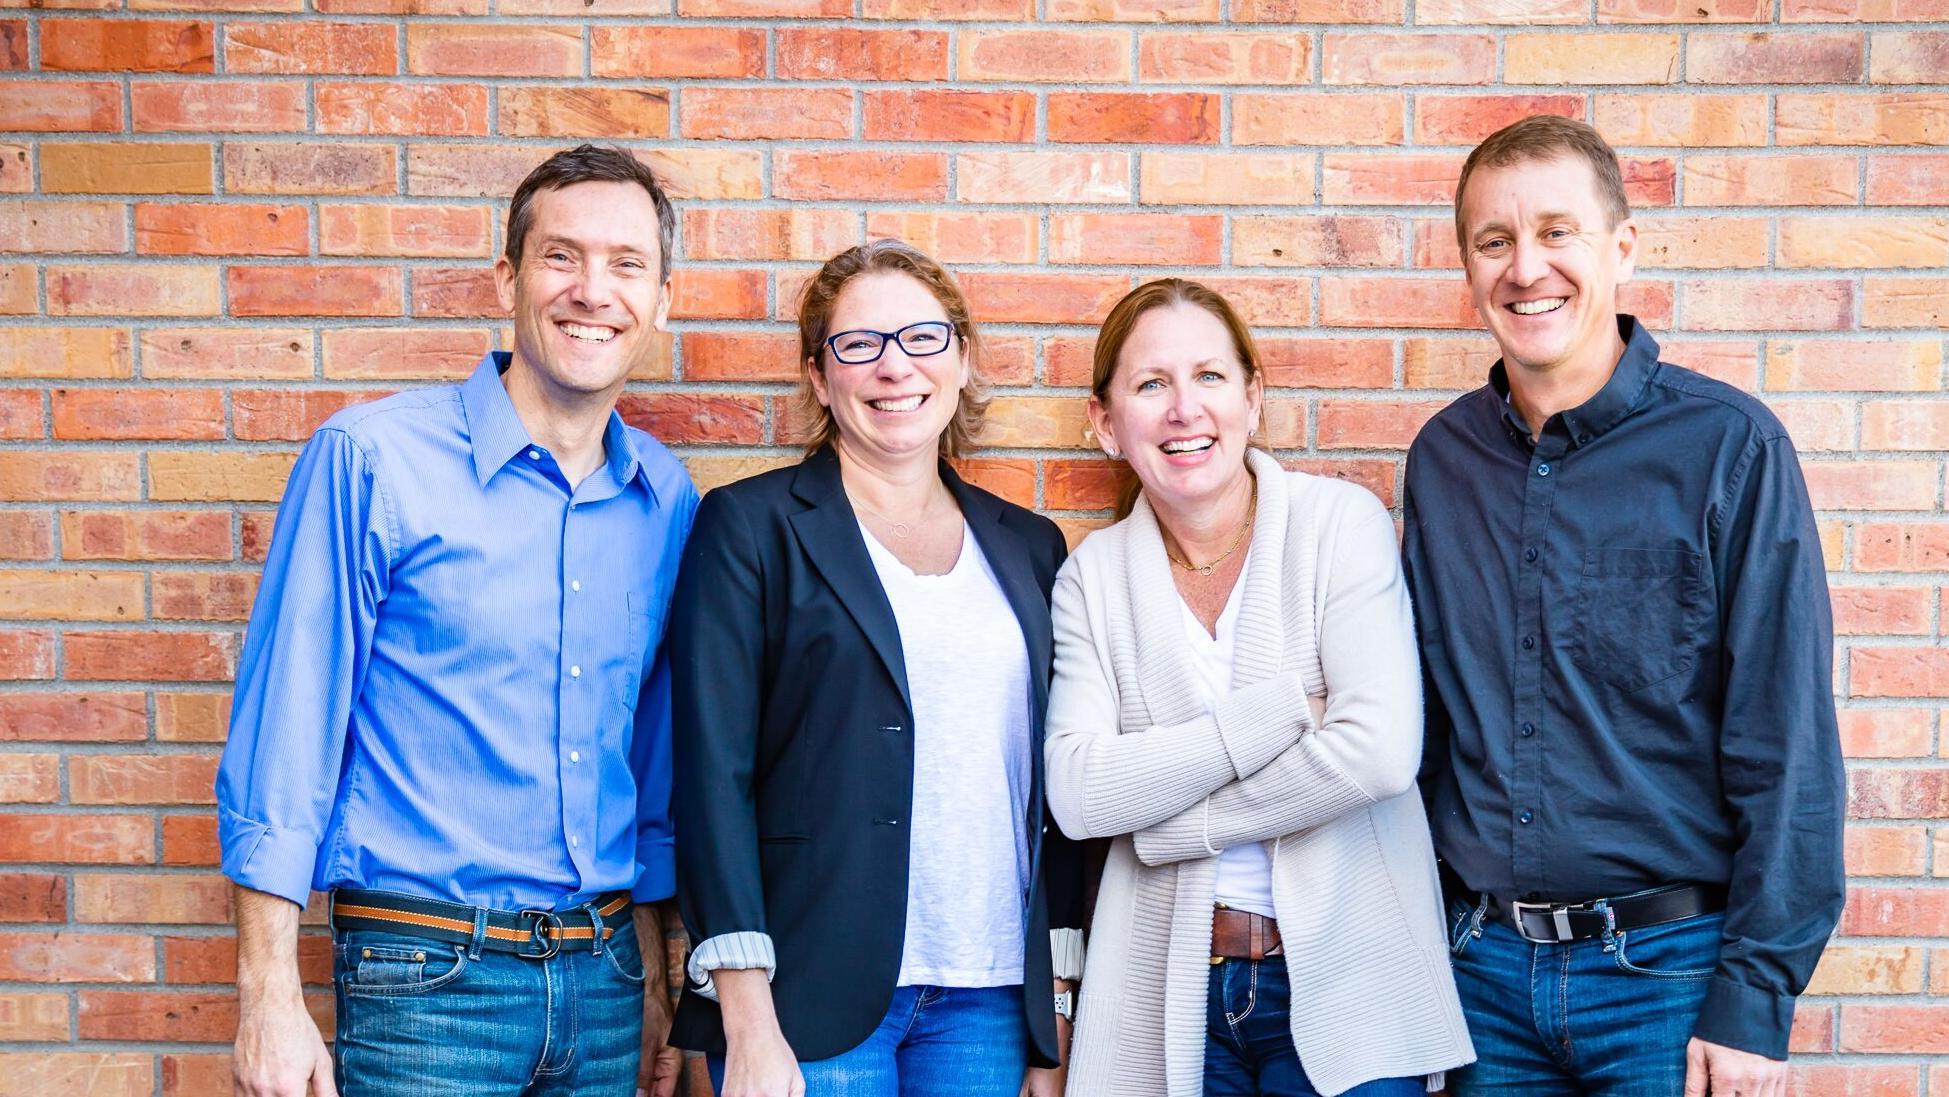 From left to right: Shawn Bertini, Partner; Amanda Montgomery, Partner; Stephanie Copeland, Partner; Chris Montgomery, Partner. (PC: Four Points Funding)